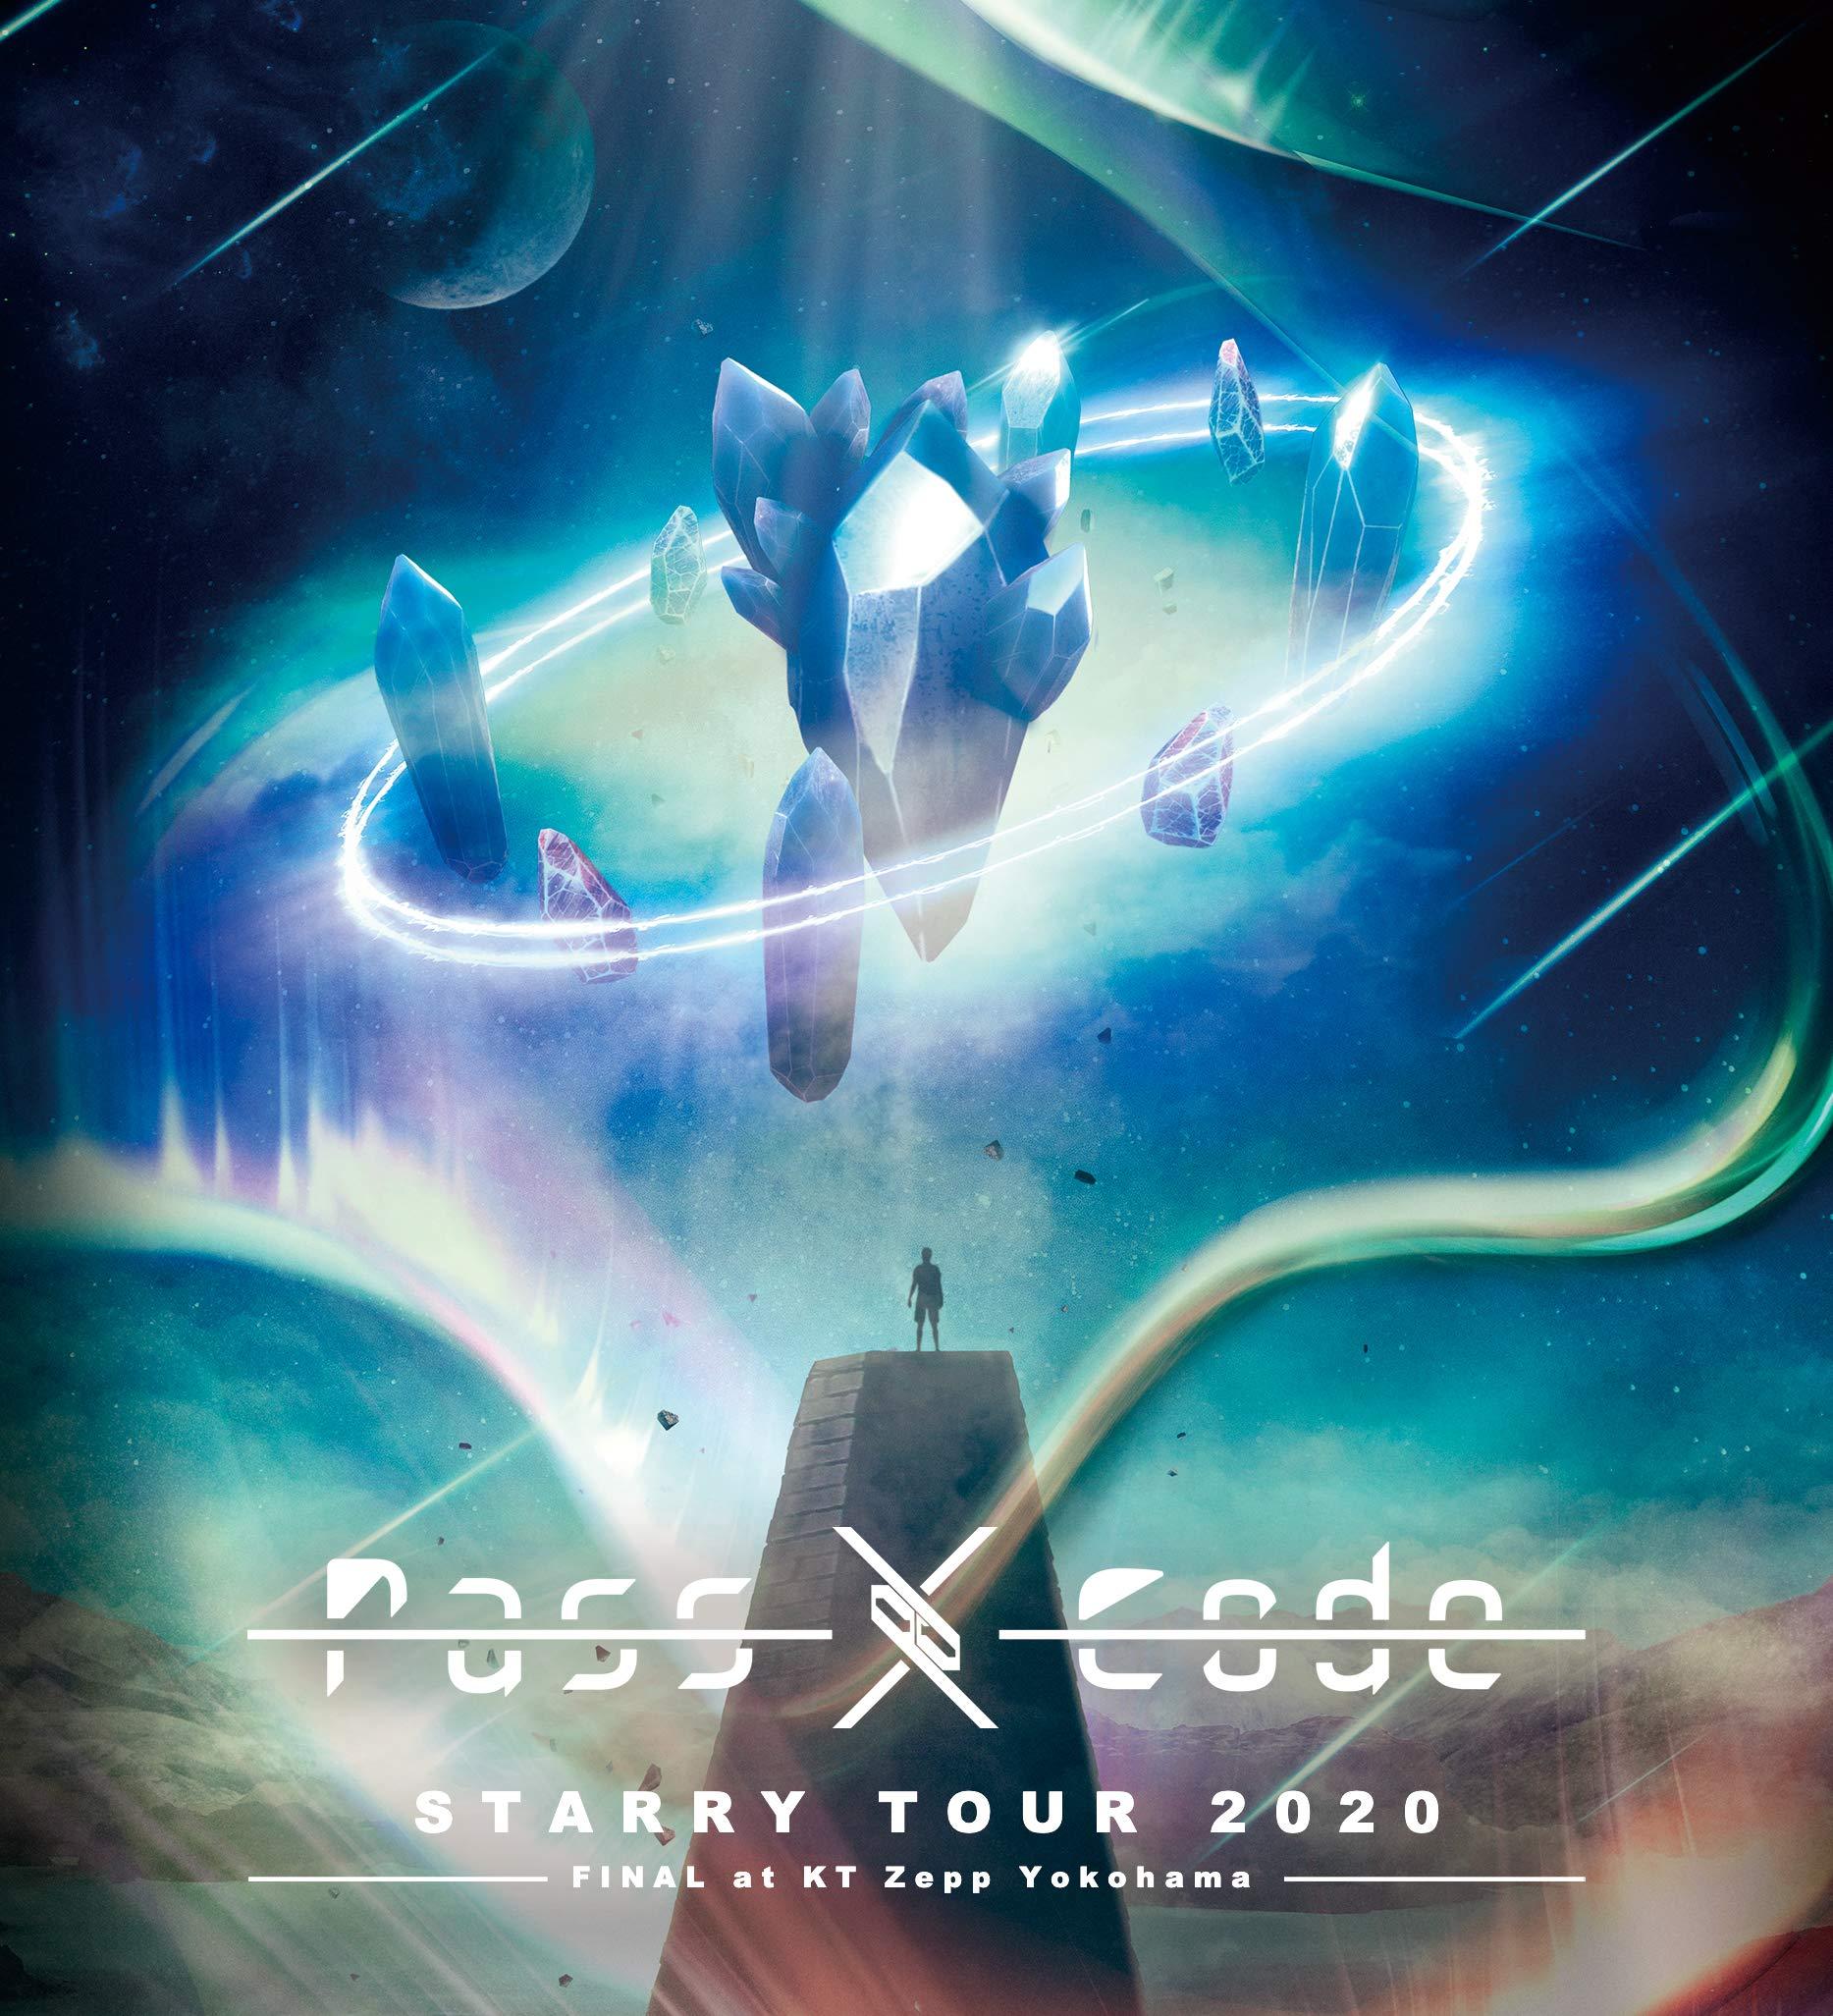 [Album] PassCode – PassCode STARRY TOUR 2020 FINAL at KT Zepp Yokohama [CD FLAC + Blu-ray ISO] [2020.11.18]